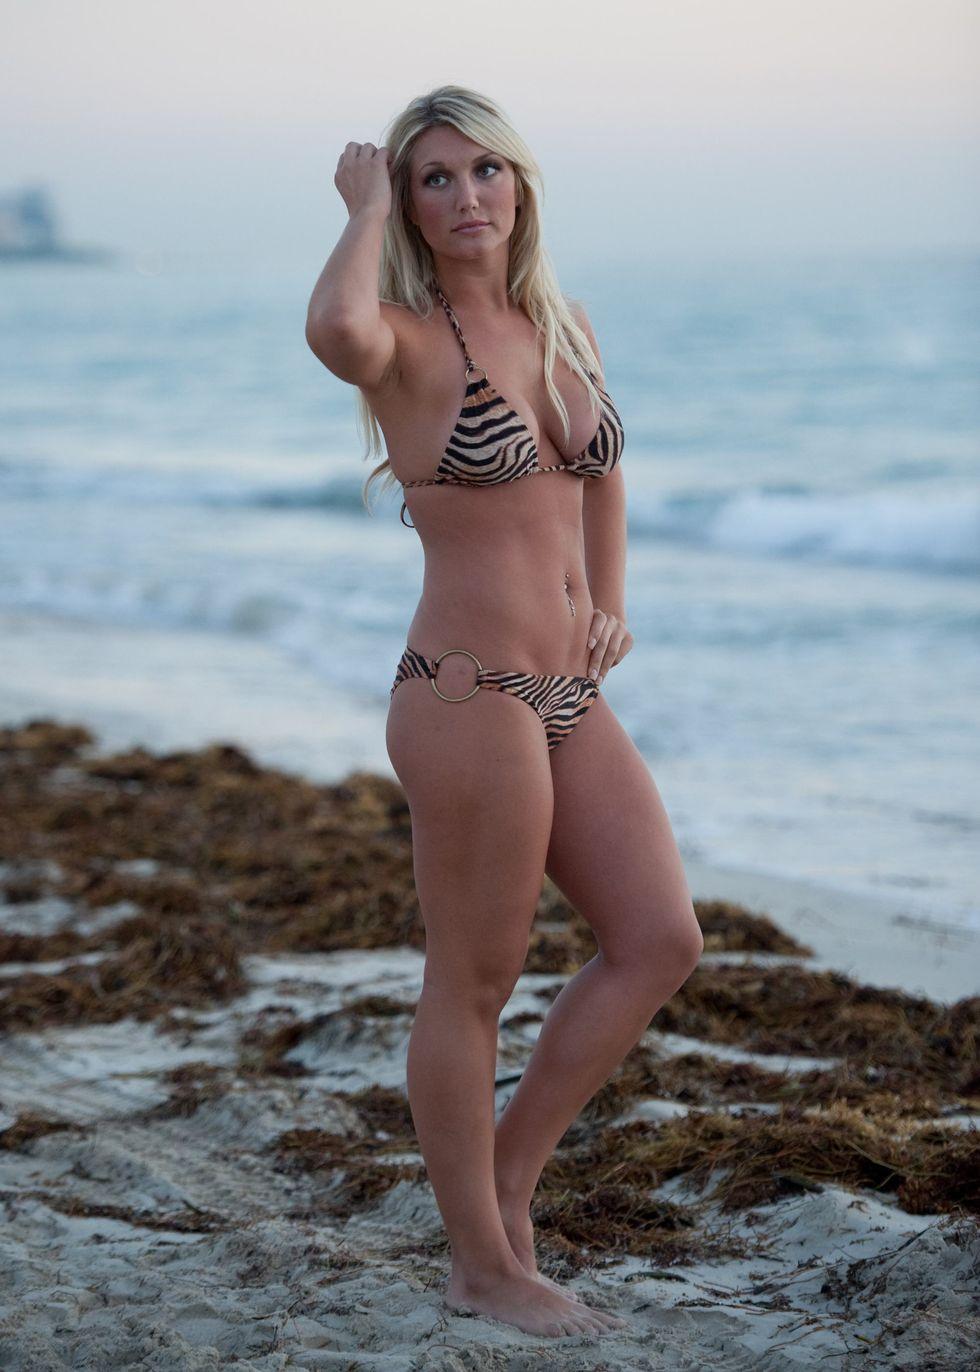 brooke hogan in bikini for a shoot in miami beach 06 | GotCeleb